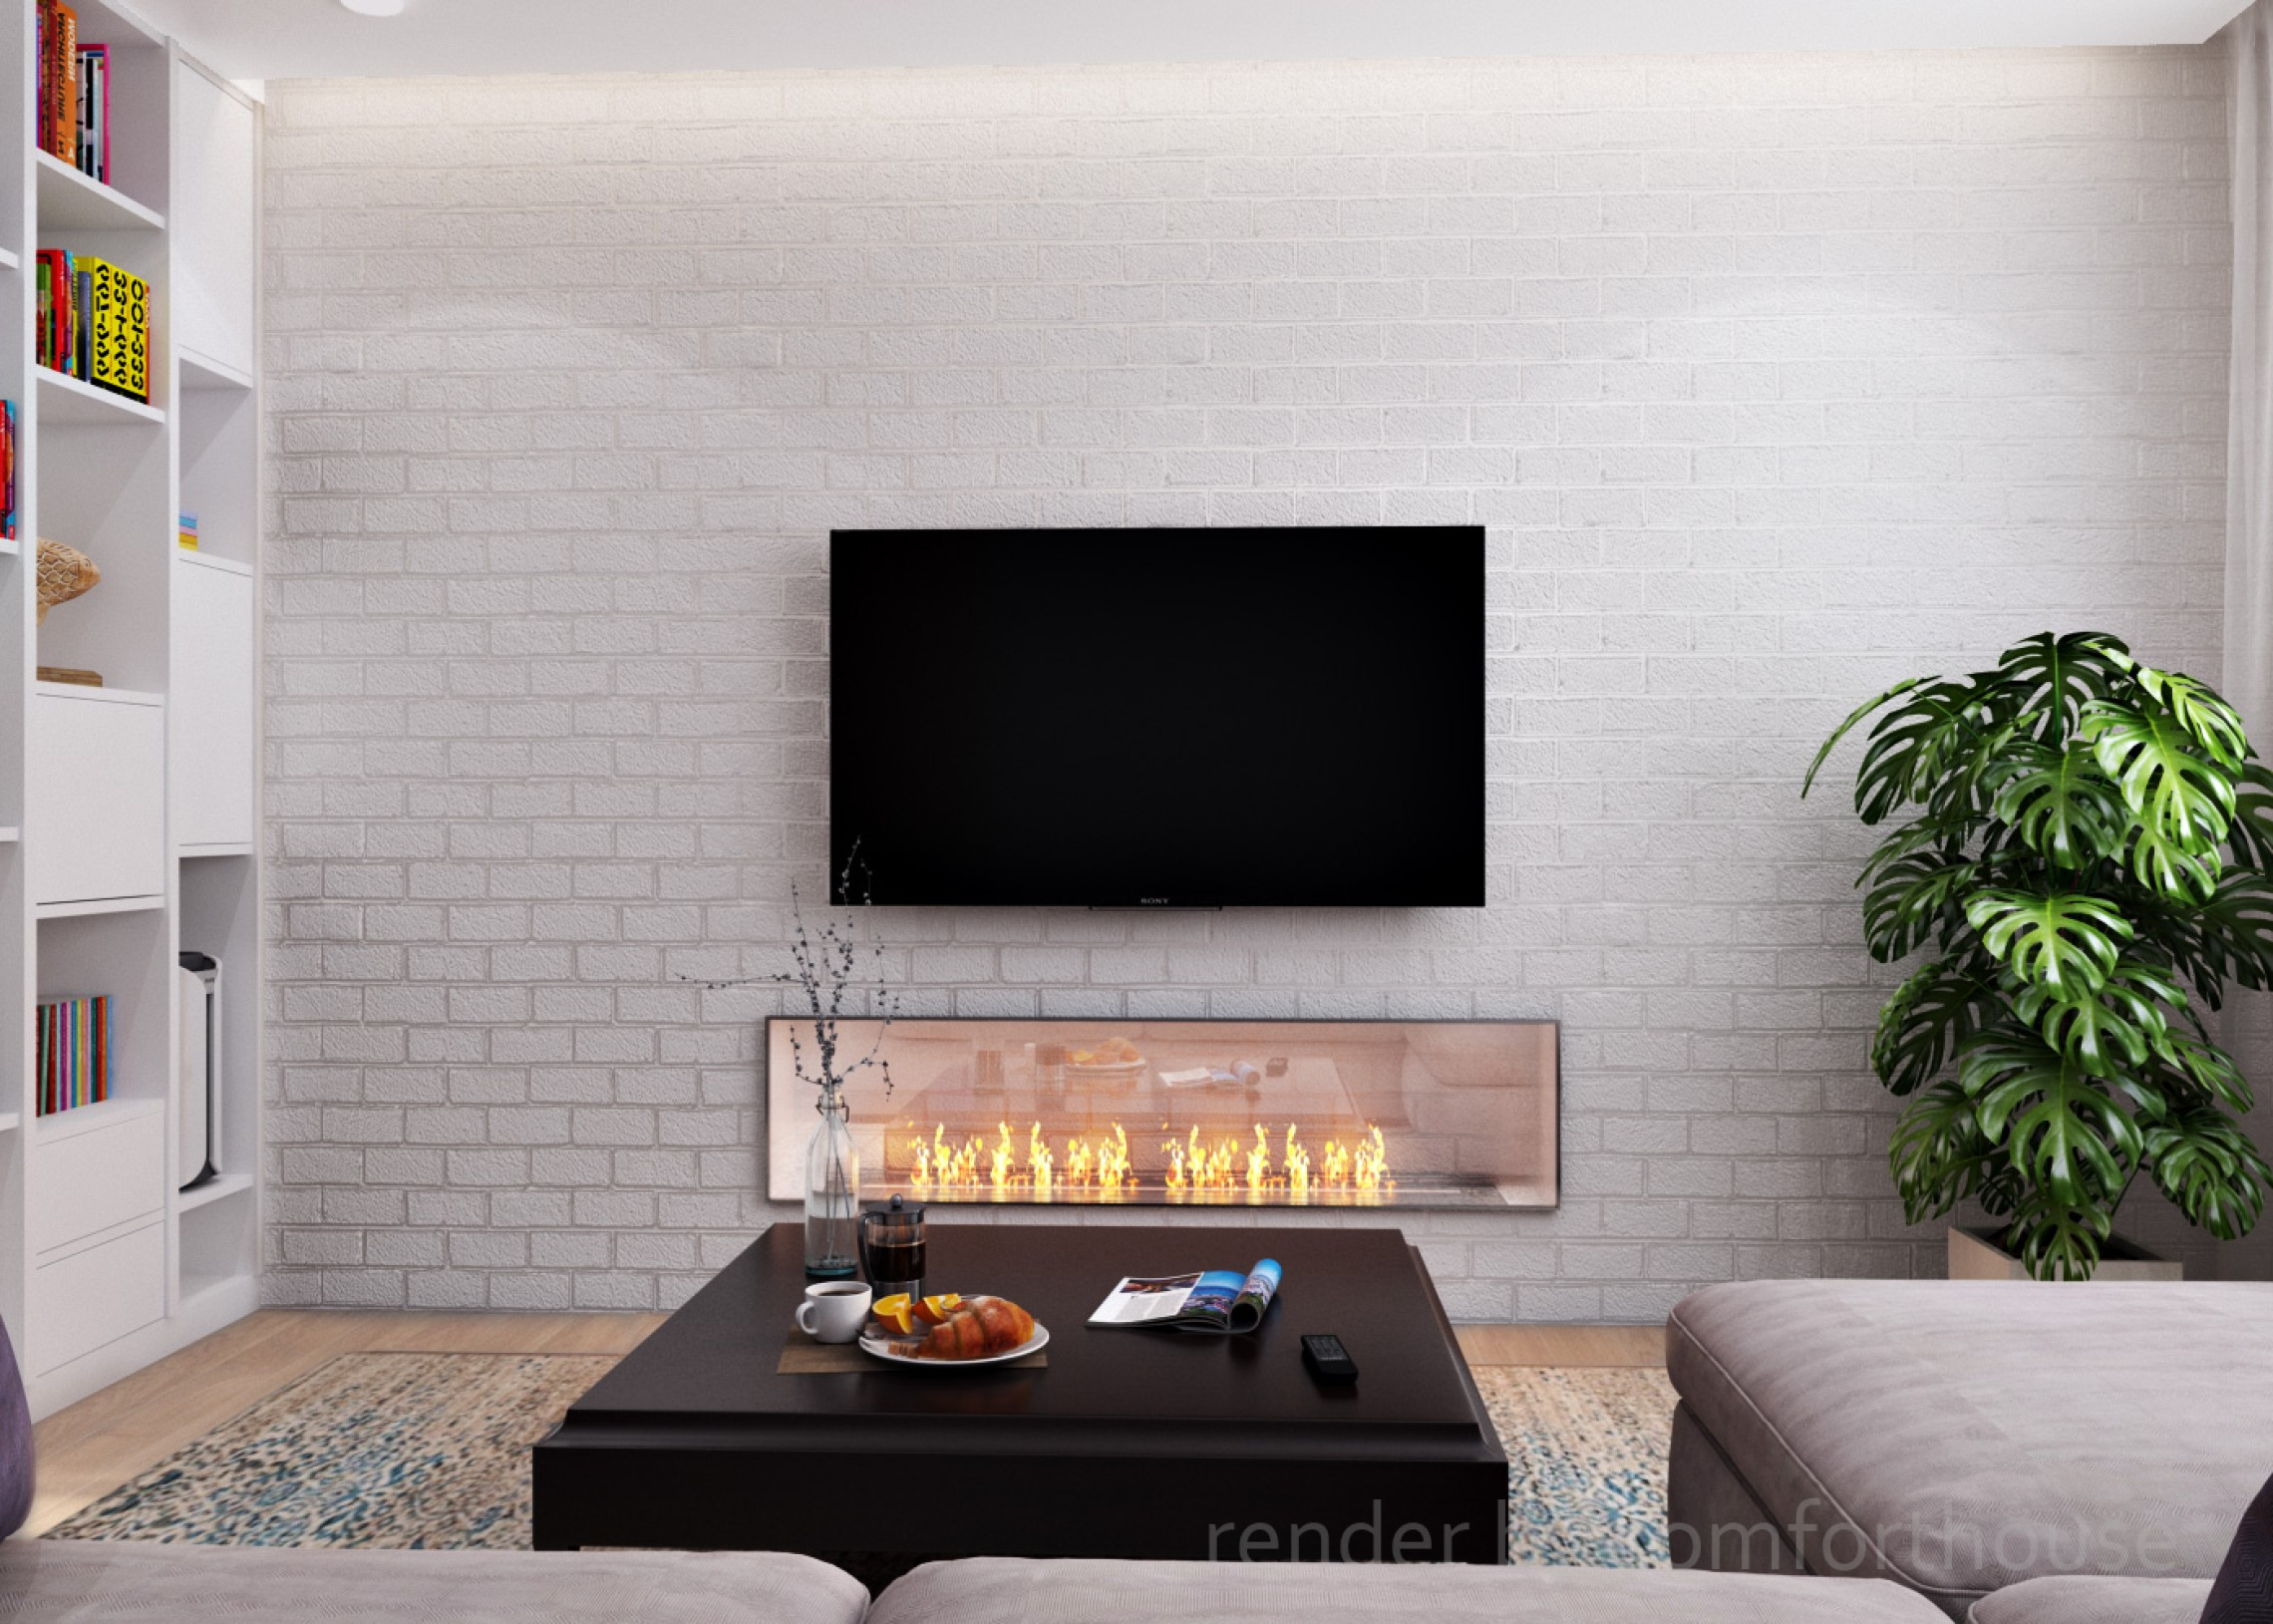 Modern light interior bio fireplace